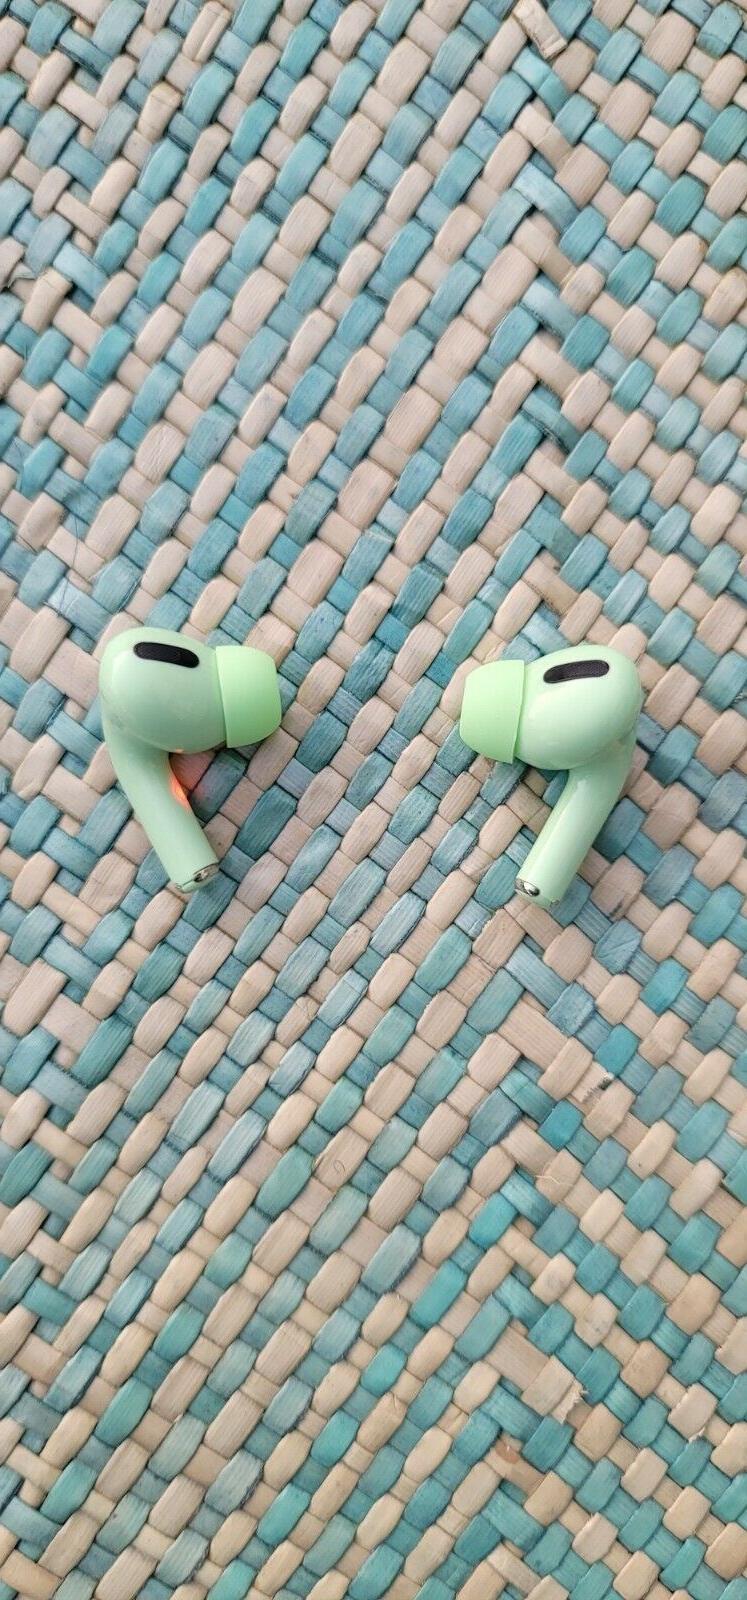 New Wireless earbuds waterproof bluetooth headphone noise canceling-Must See